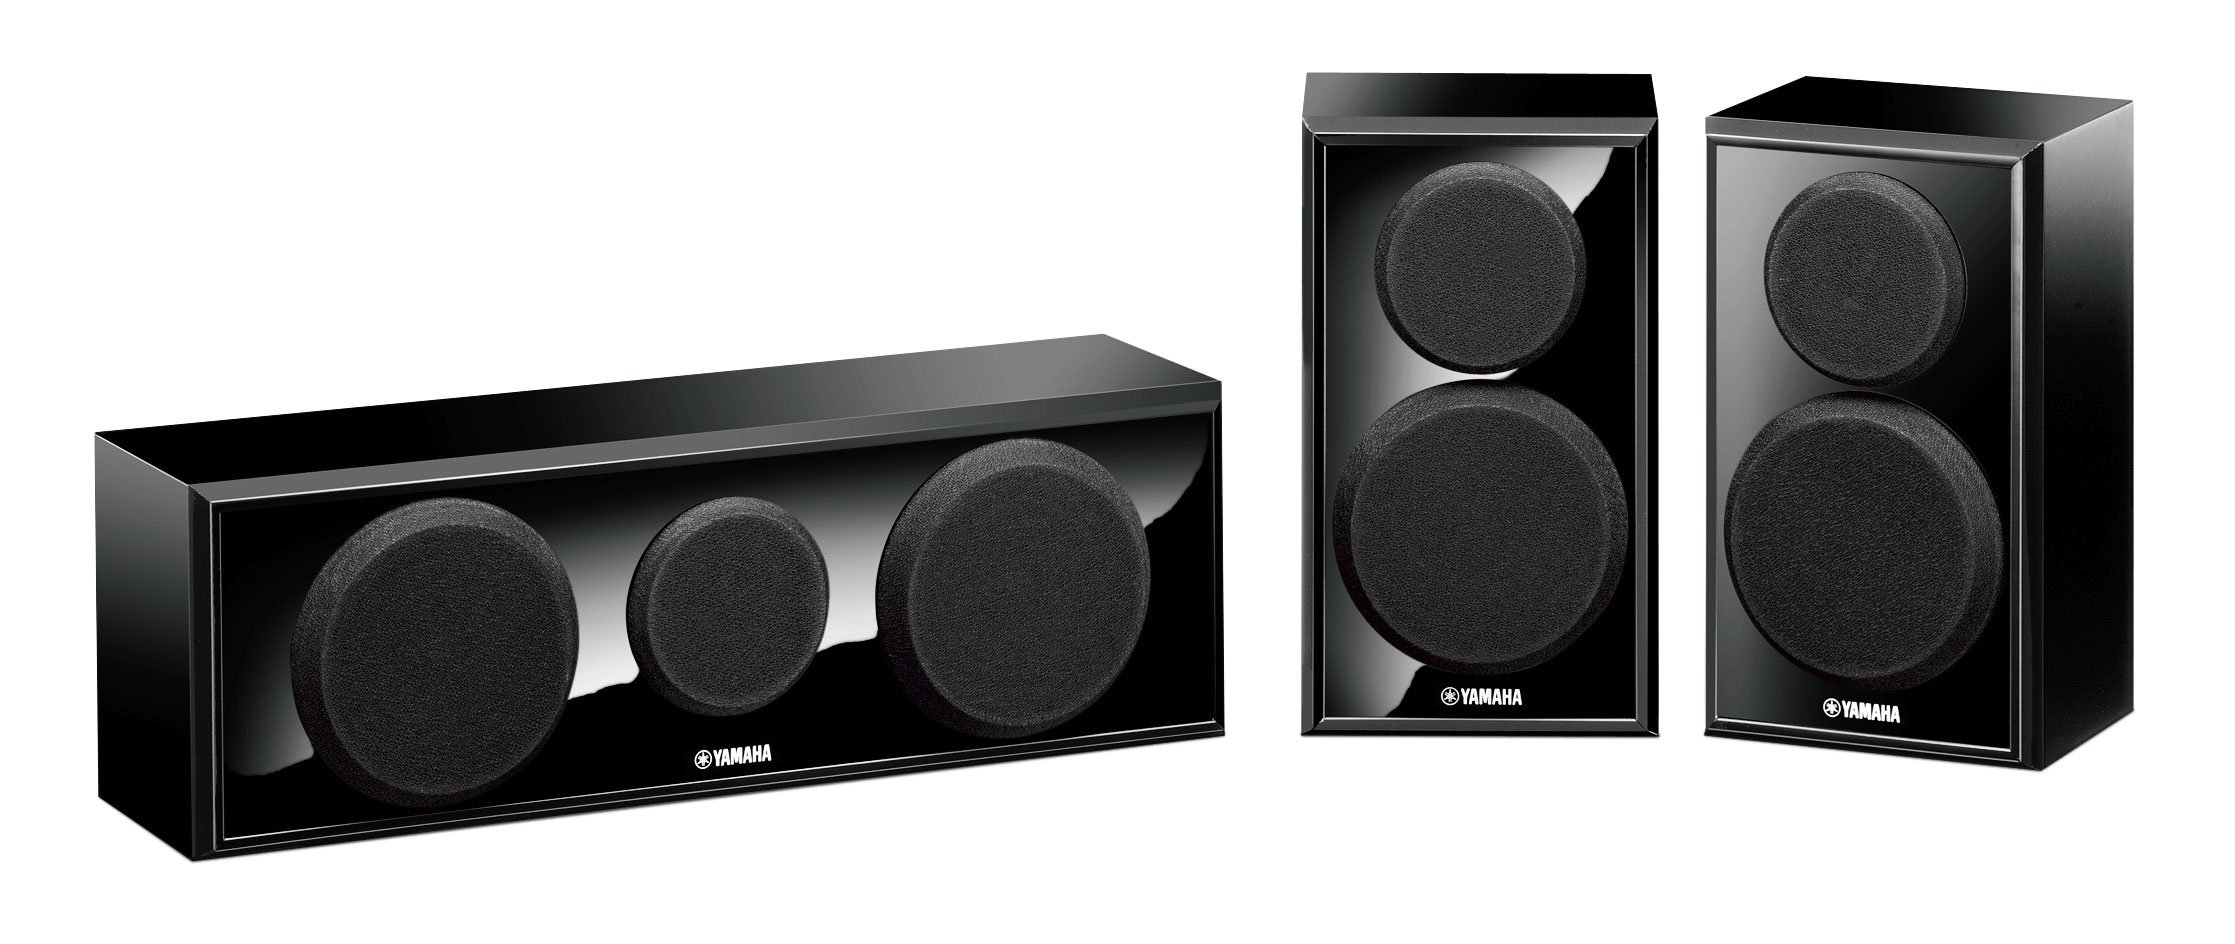 Yamaha NS-P150 Center/Surround, Speaker Package (3) by Yamaha